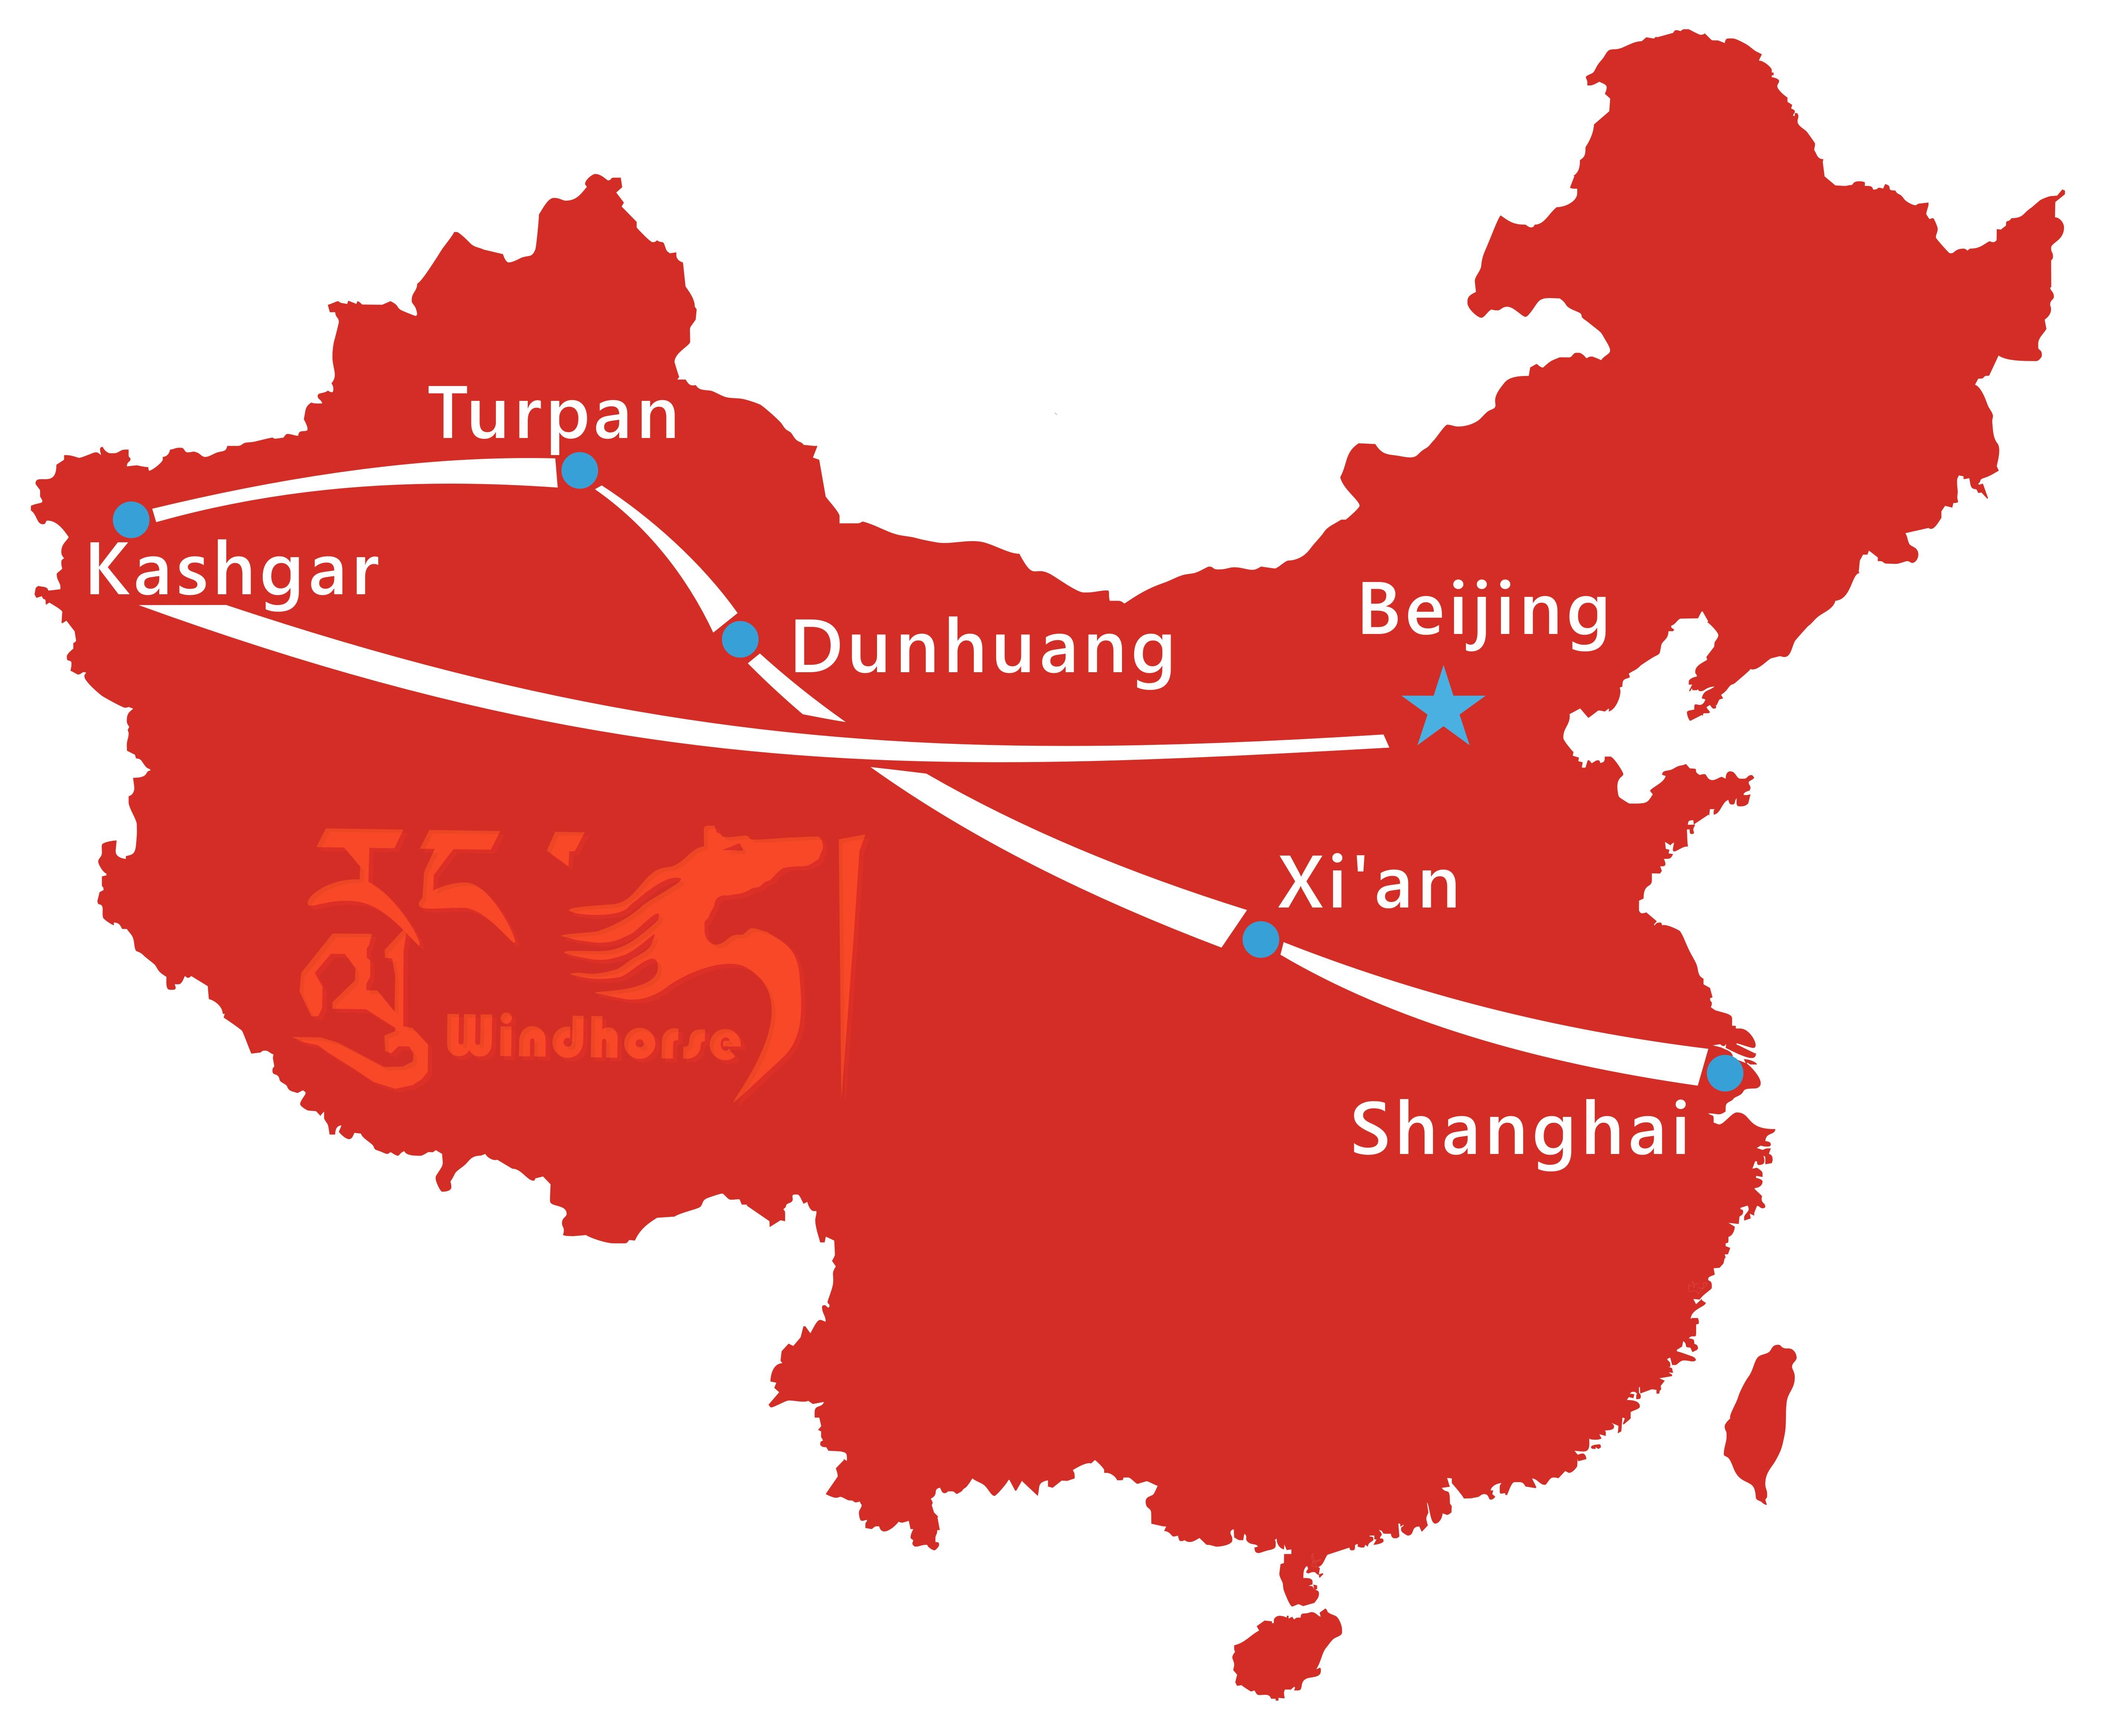 Tour Route of Silk Road Explorer